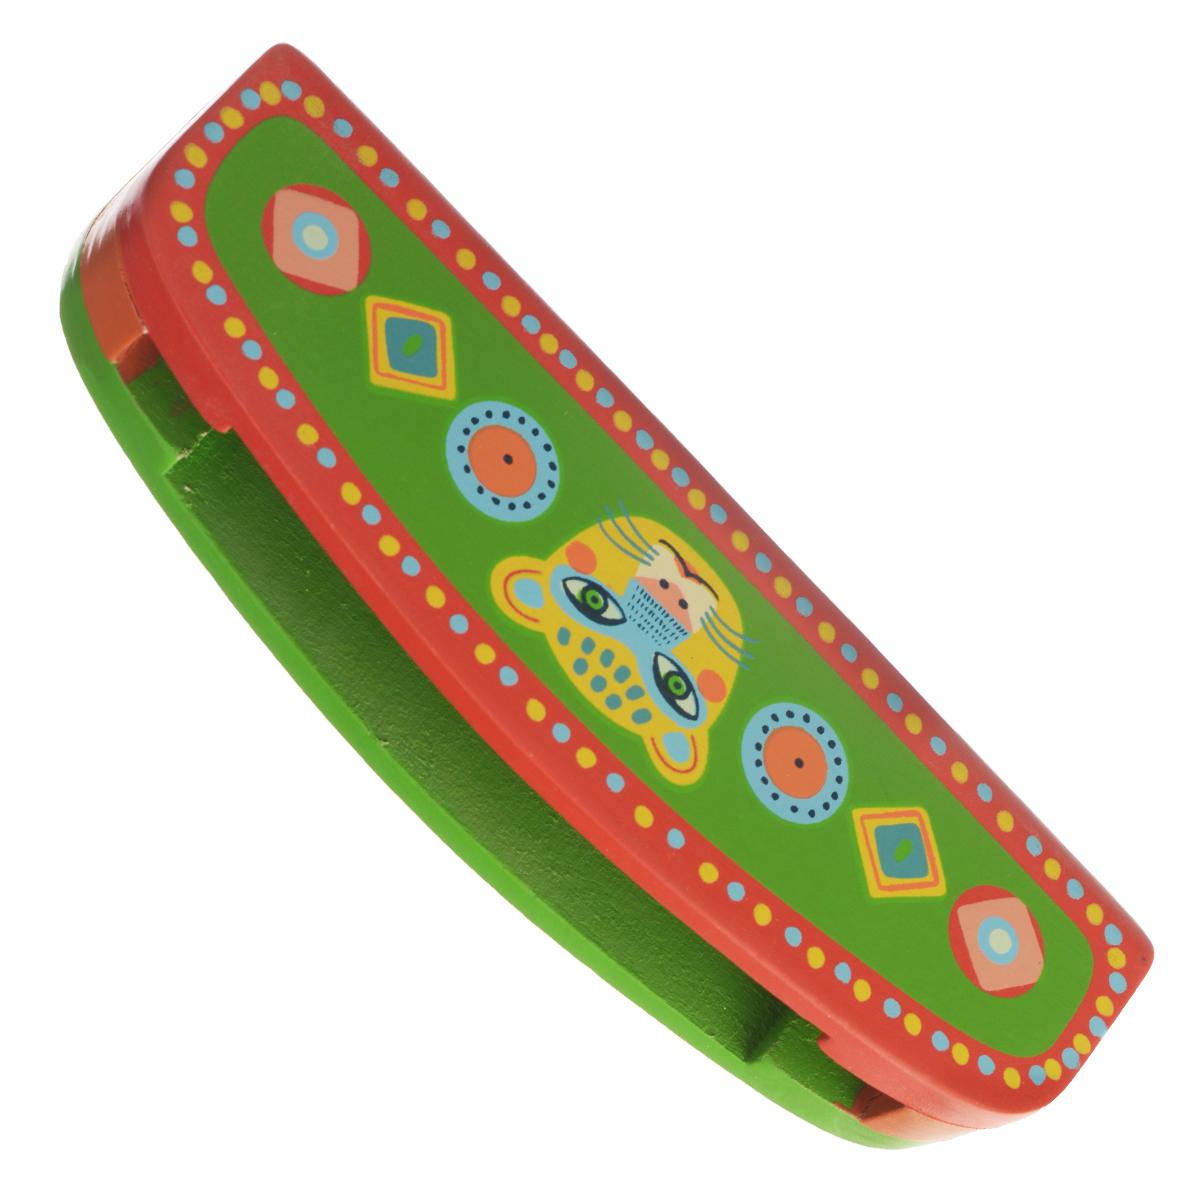 Djeco Губная гармошка Animambo, цвет: зеленый, красный djeco маракас animambo